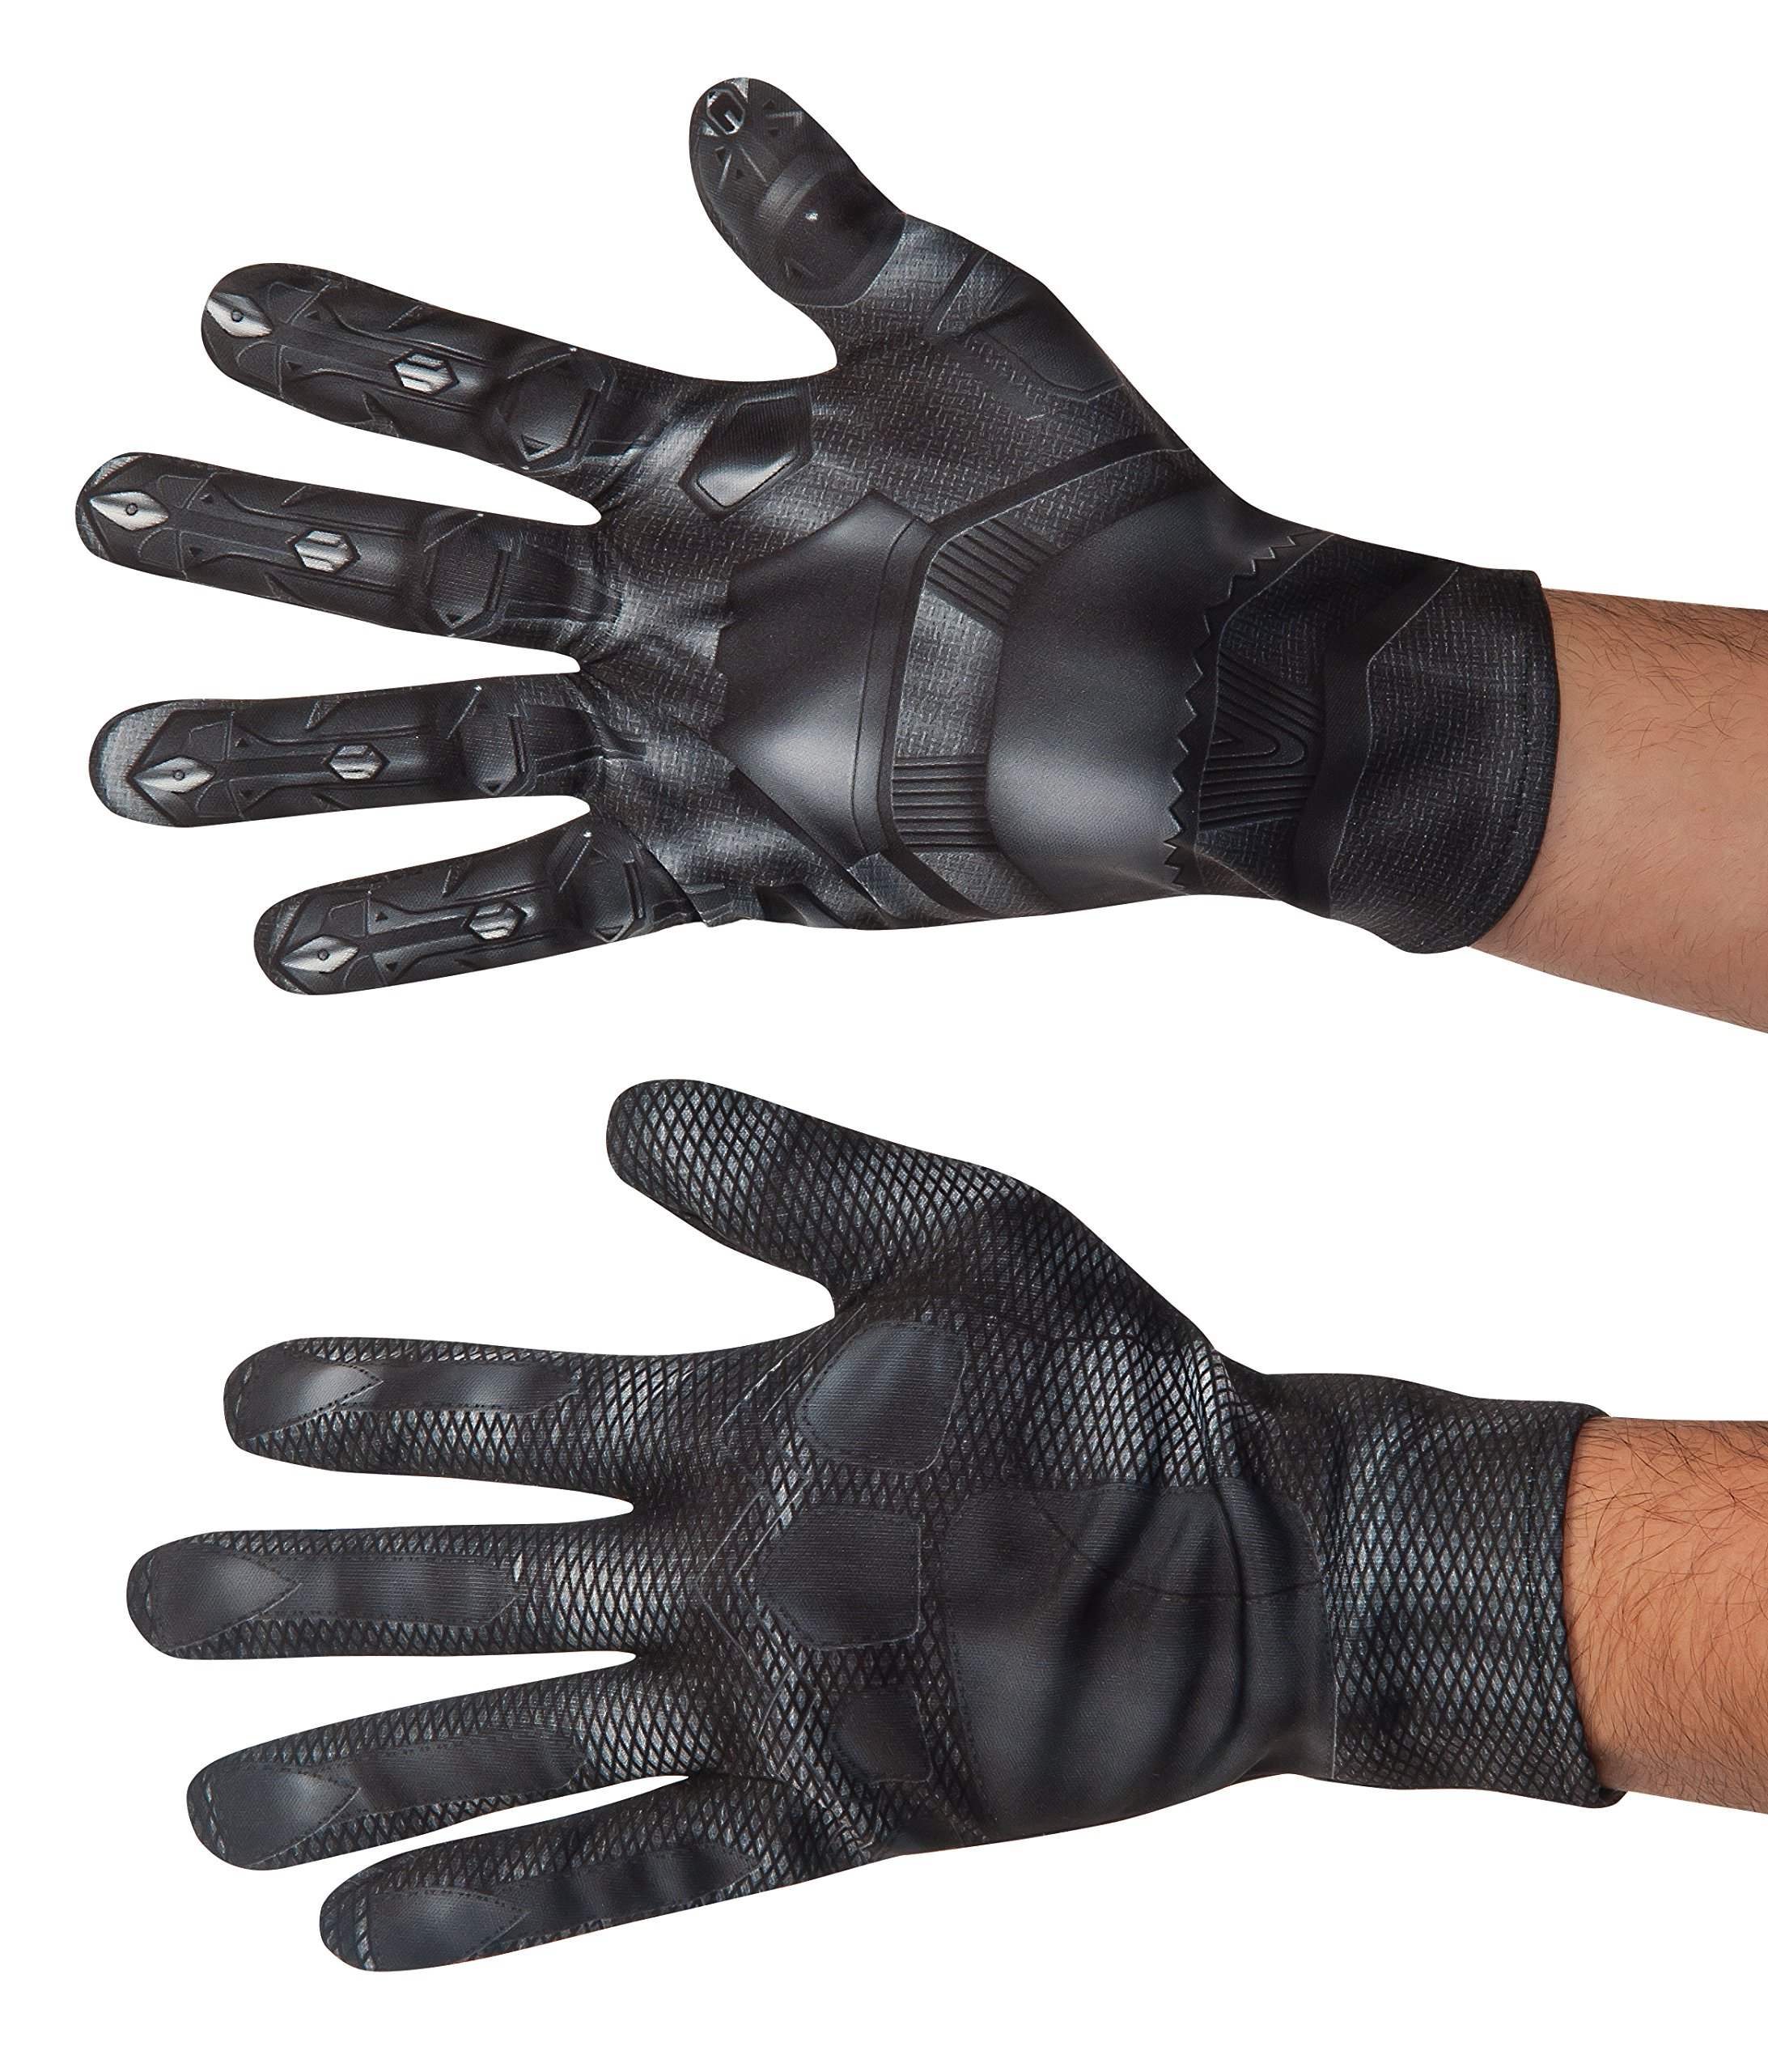 Marvel Men's Captain America: Civil War Black Panther Value Gloves, Multi, One Size by Marvel